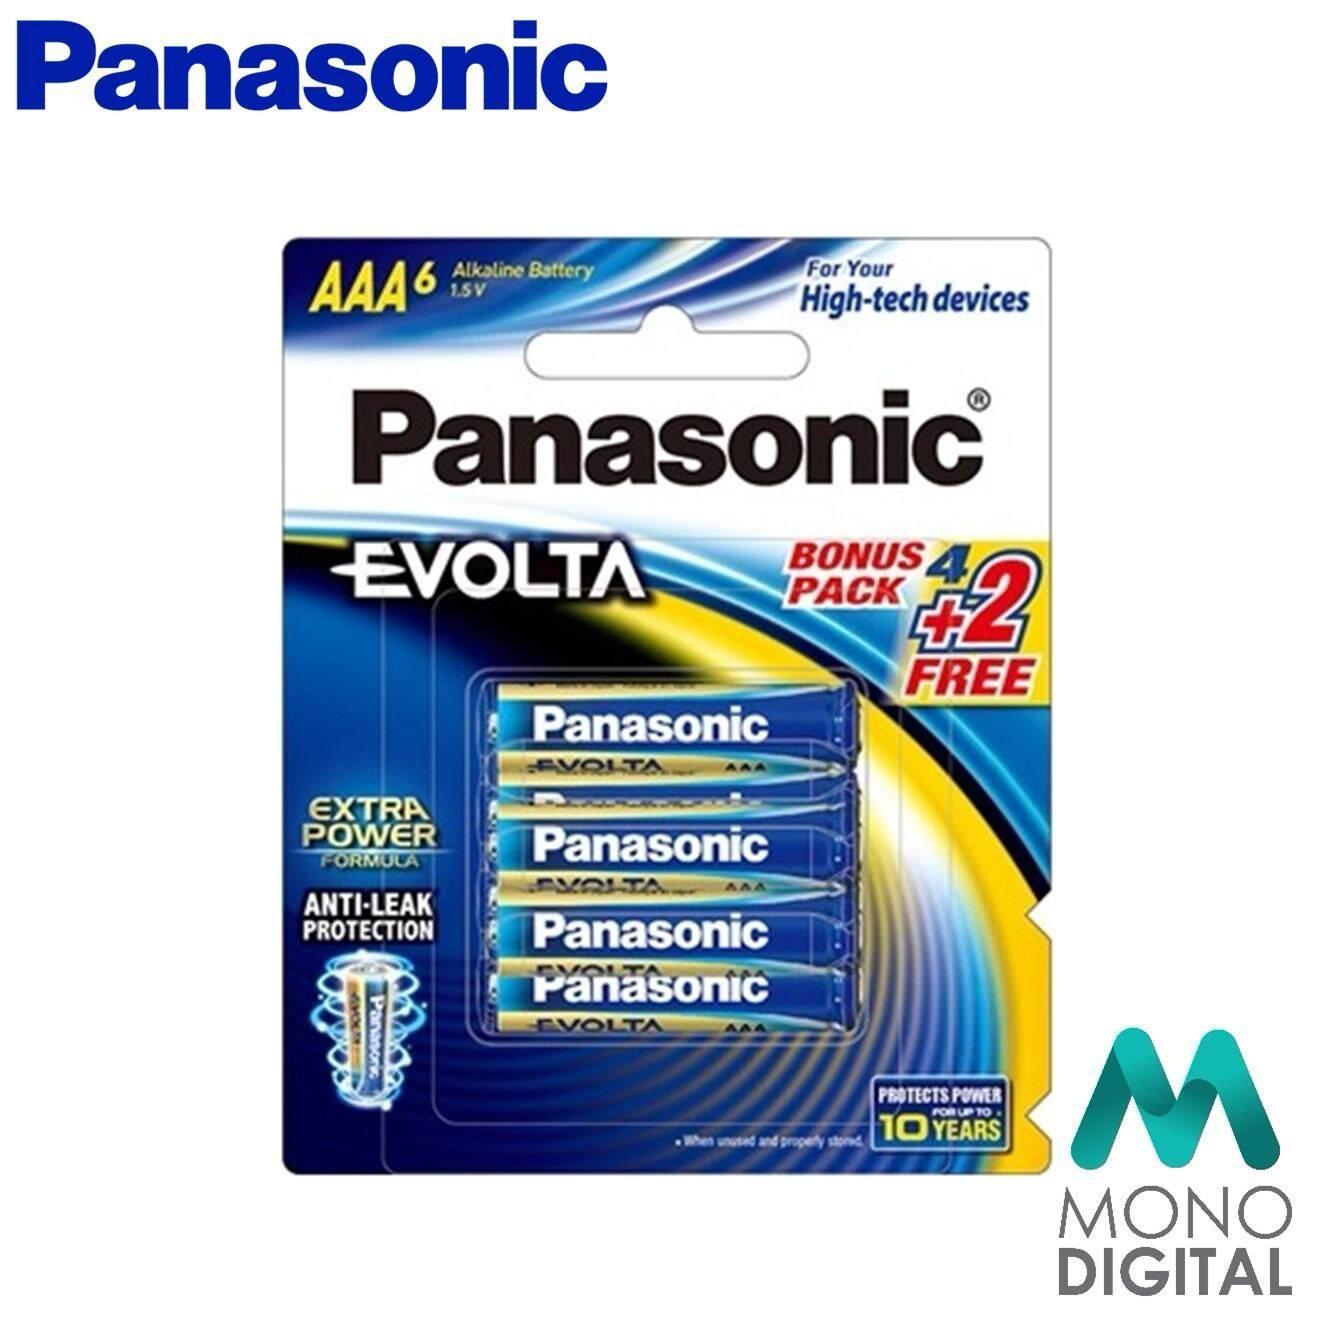 Panasonic Evolta Alkaline AAA size 4pcs+2pcs Battery (Panasonic Malaysia)